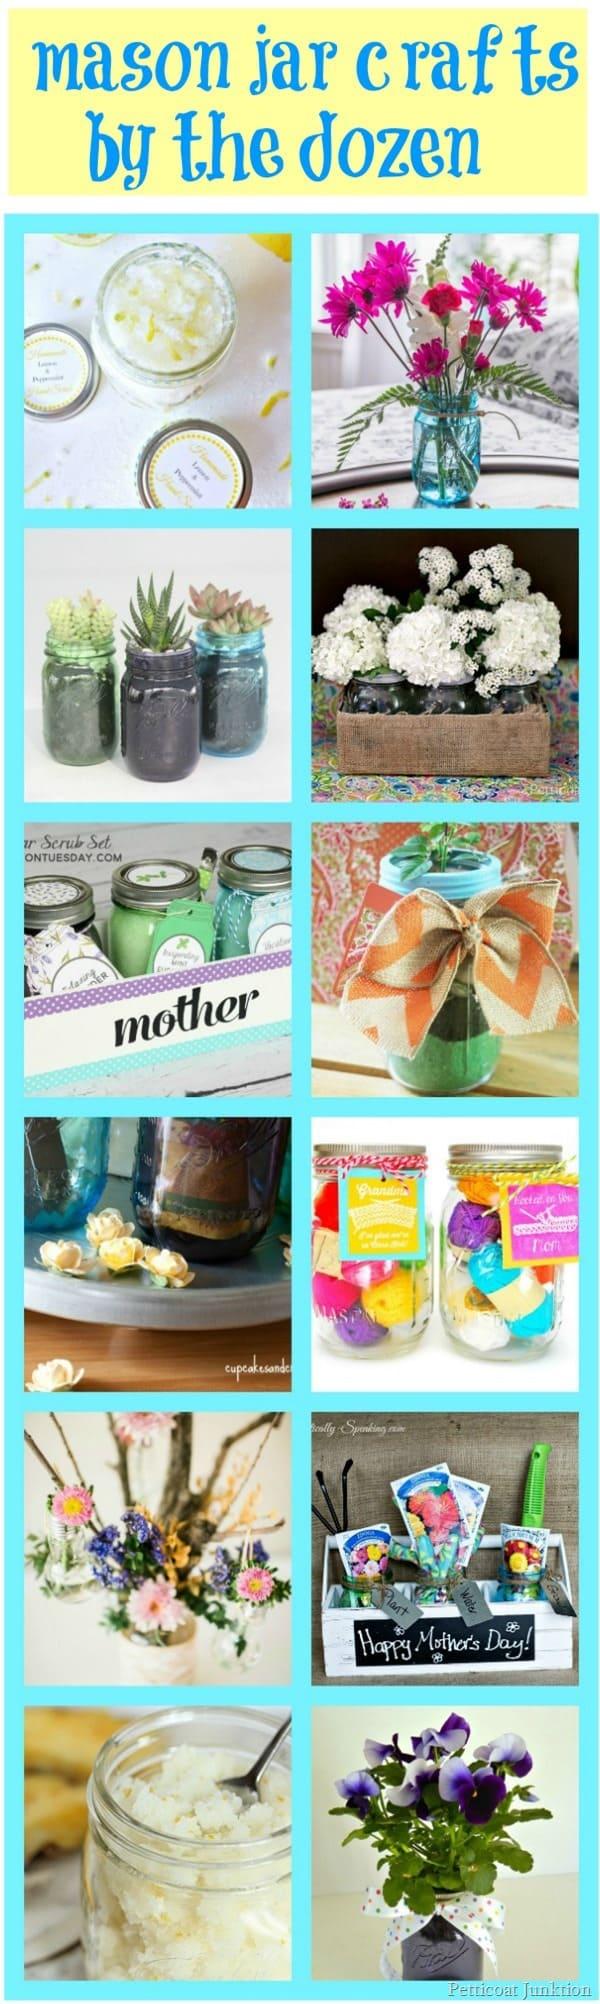 Mason Jar Crafts by the Dozen